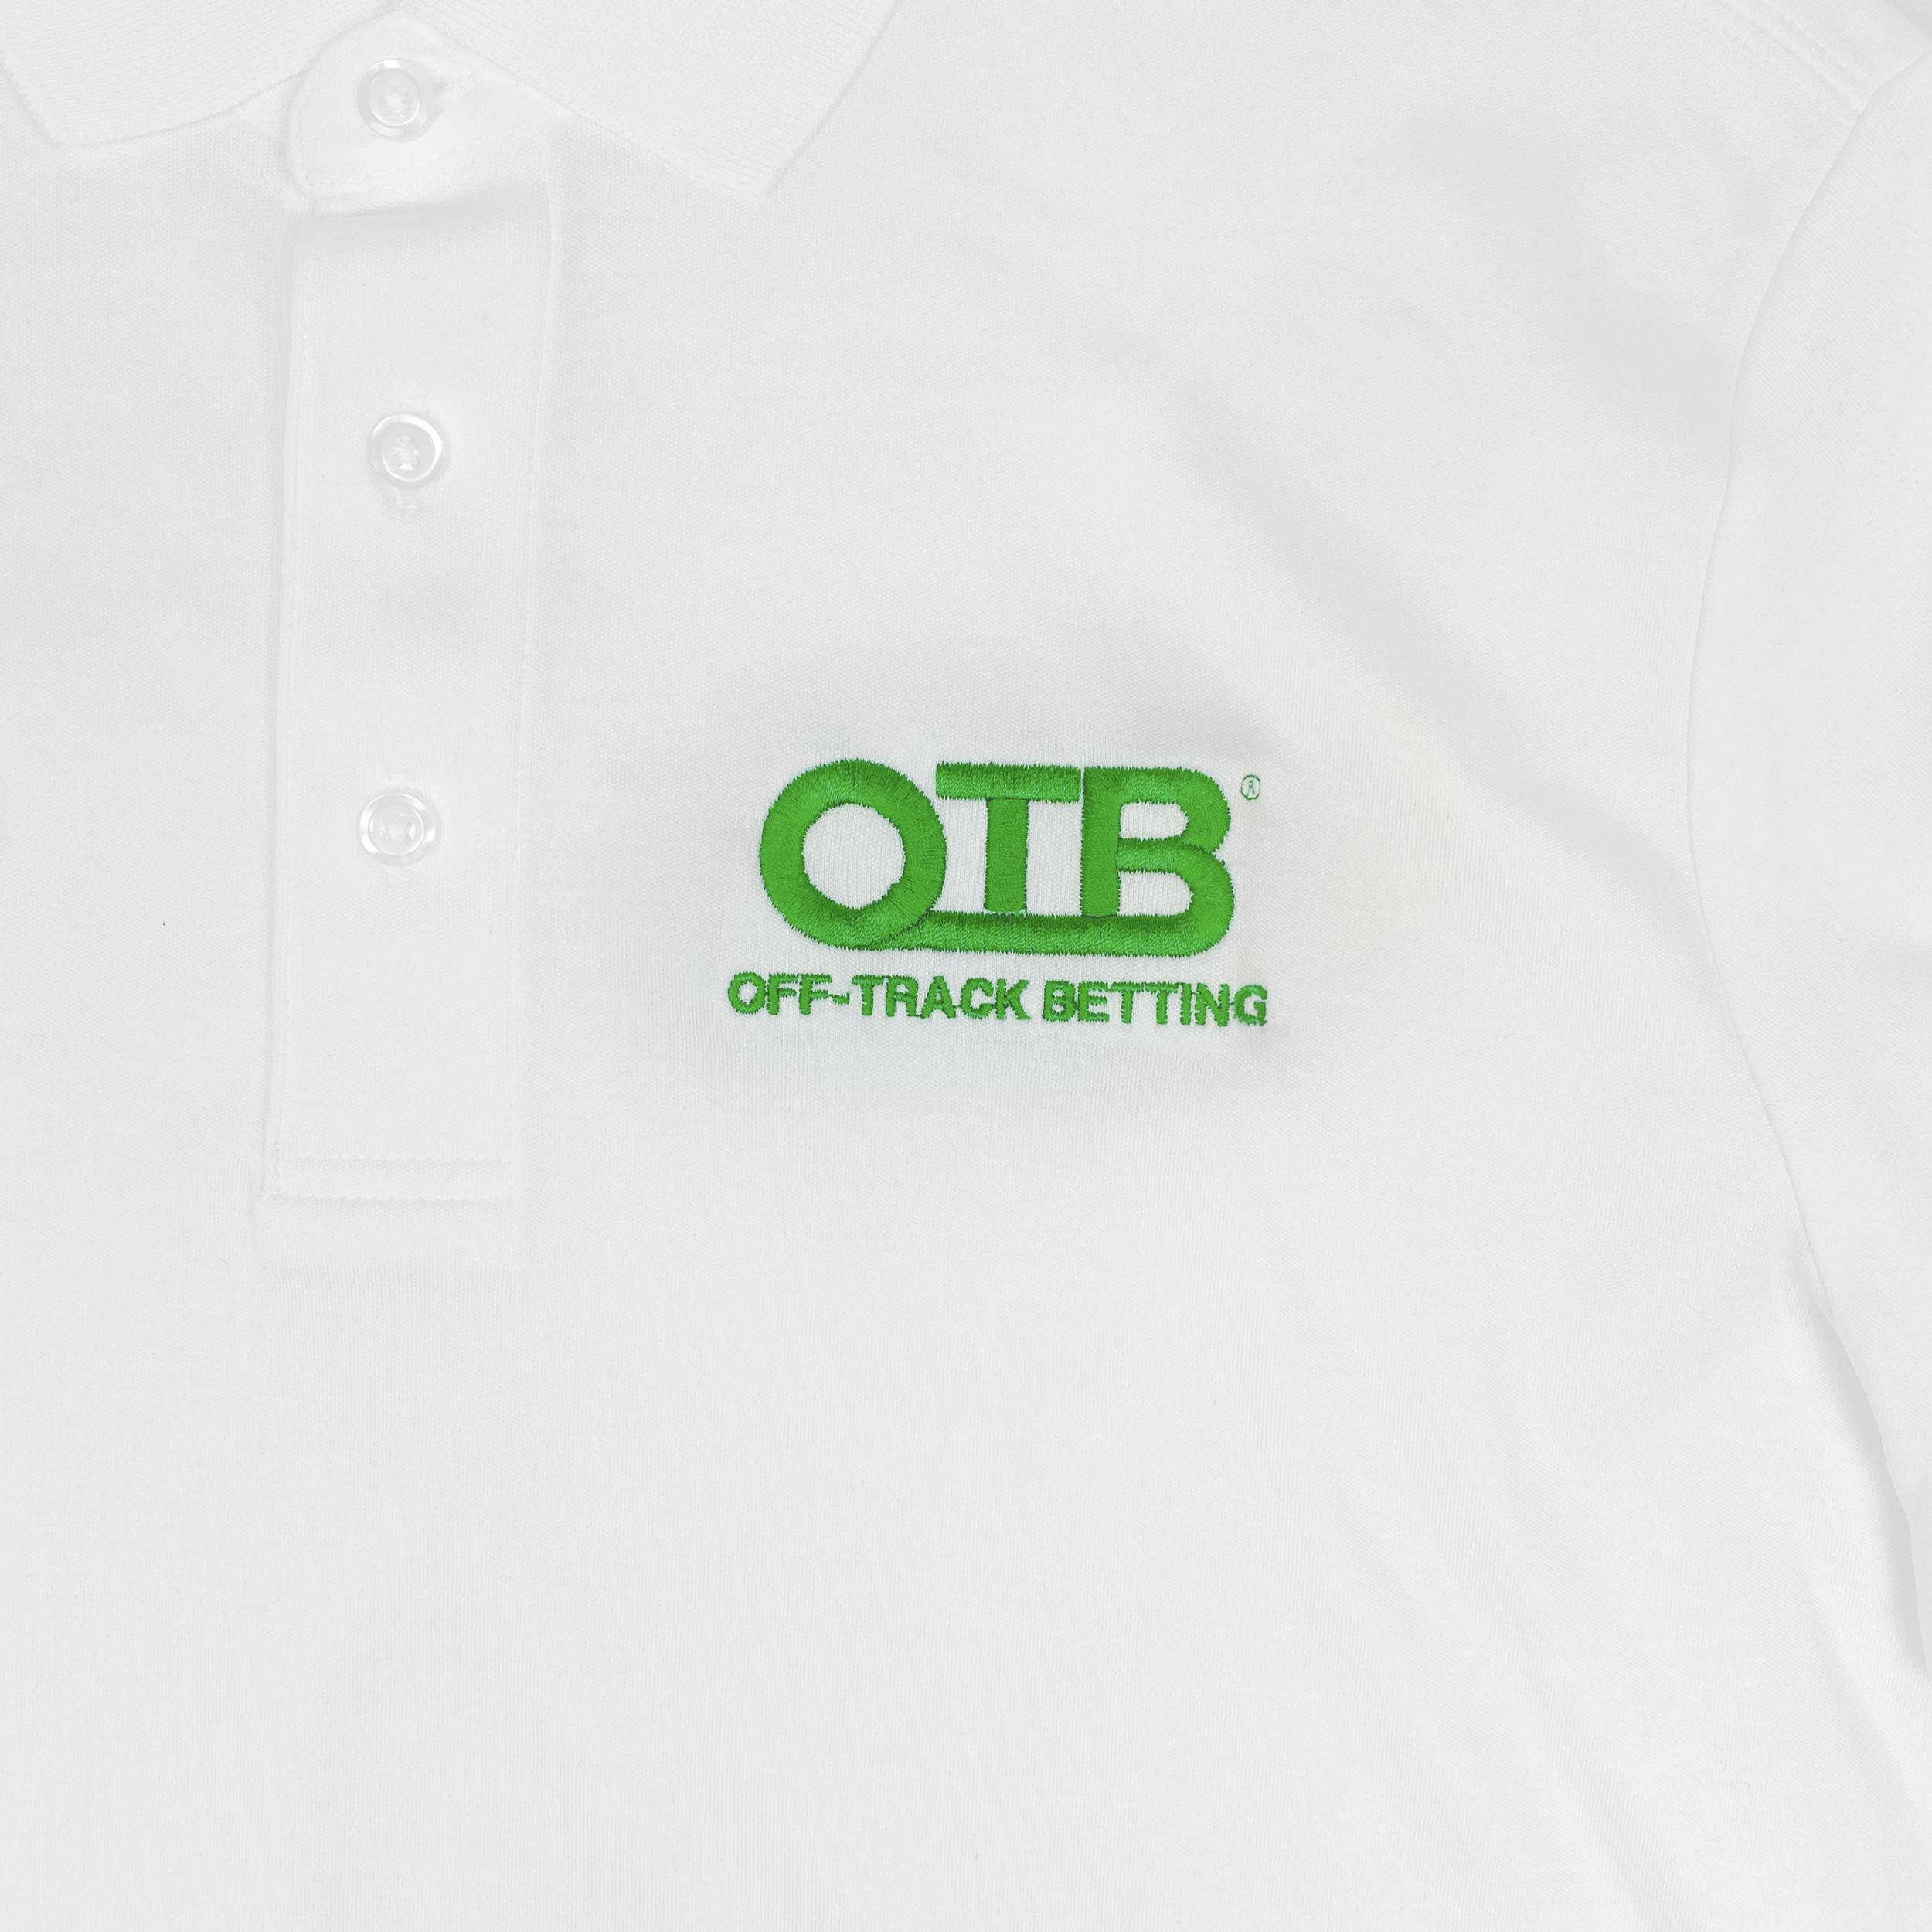 otb betting terminology